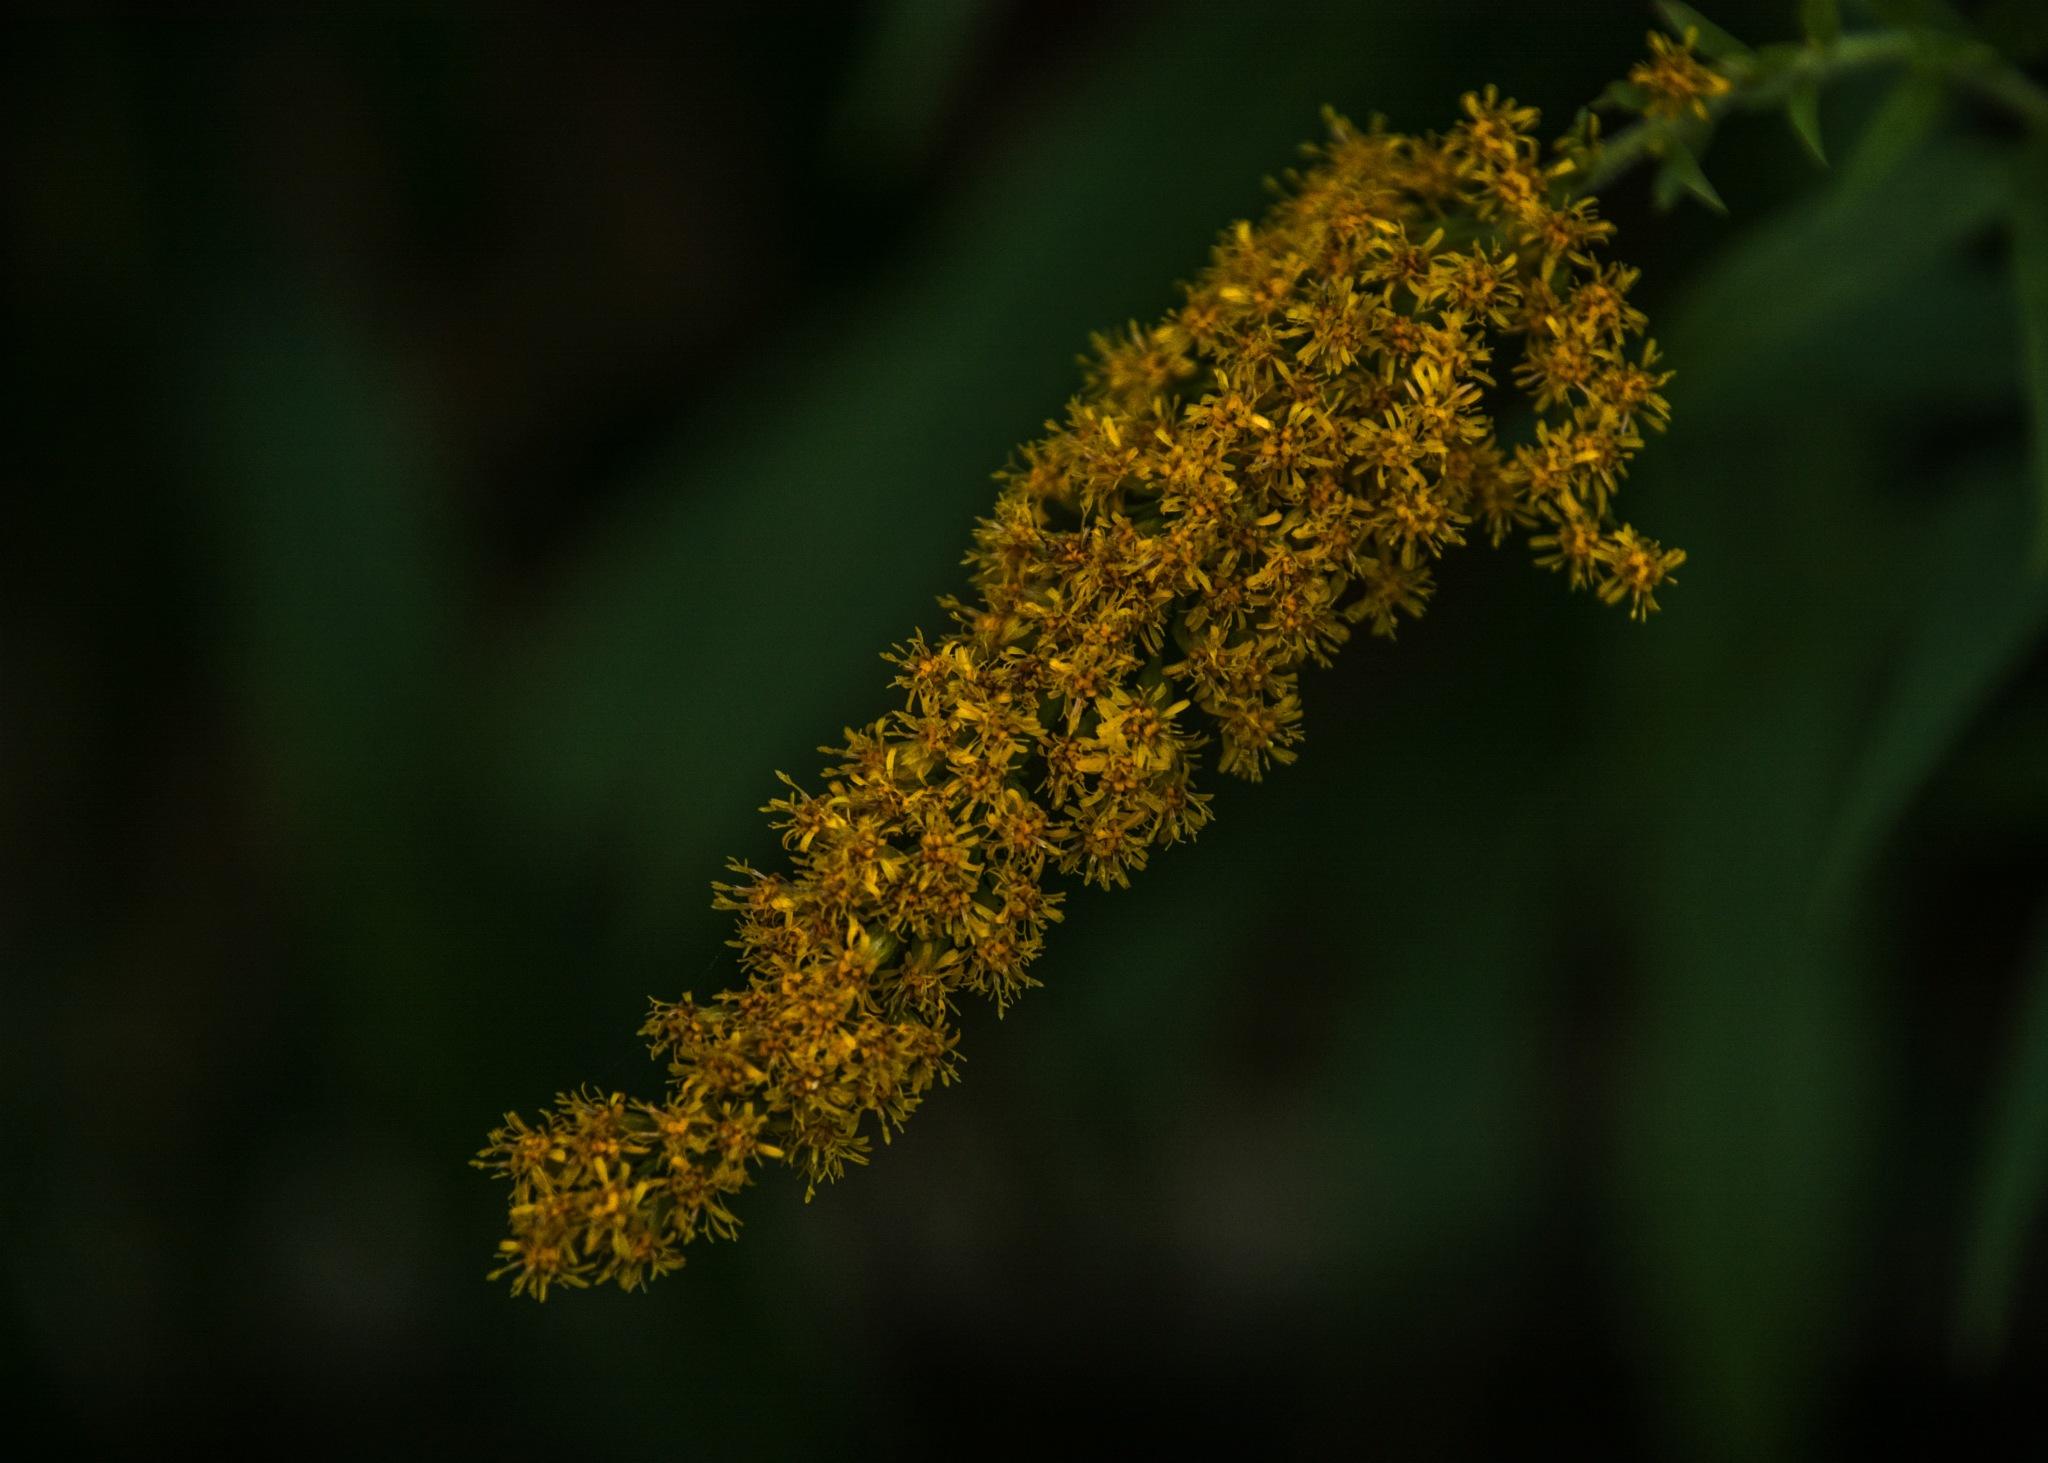 Golden Rod by BrianS